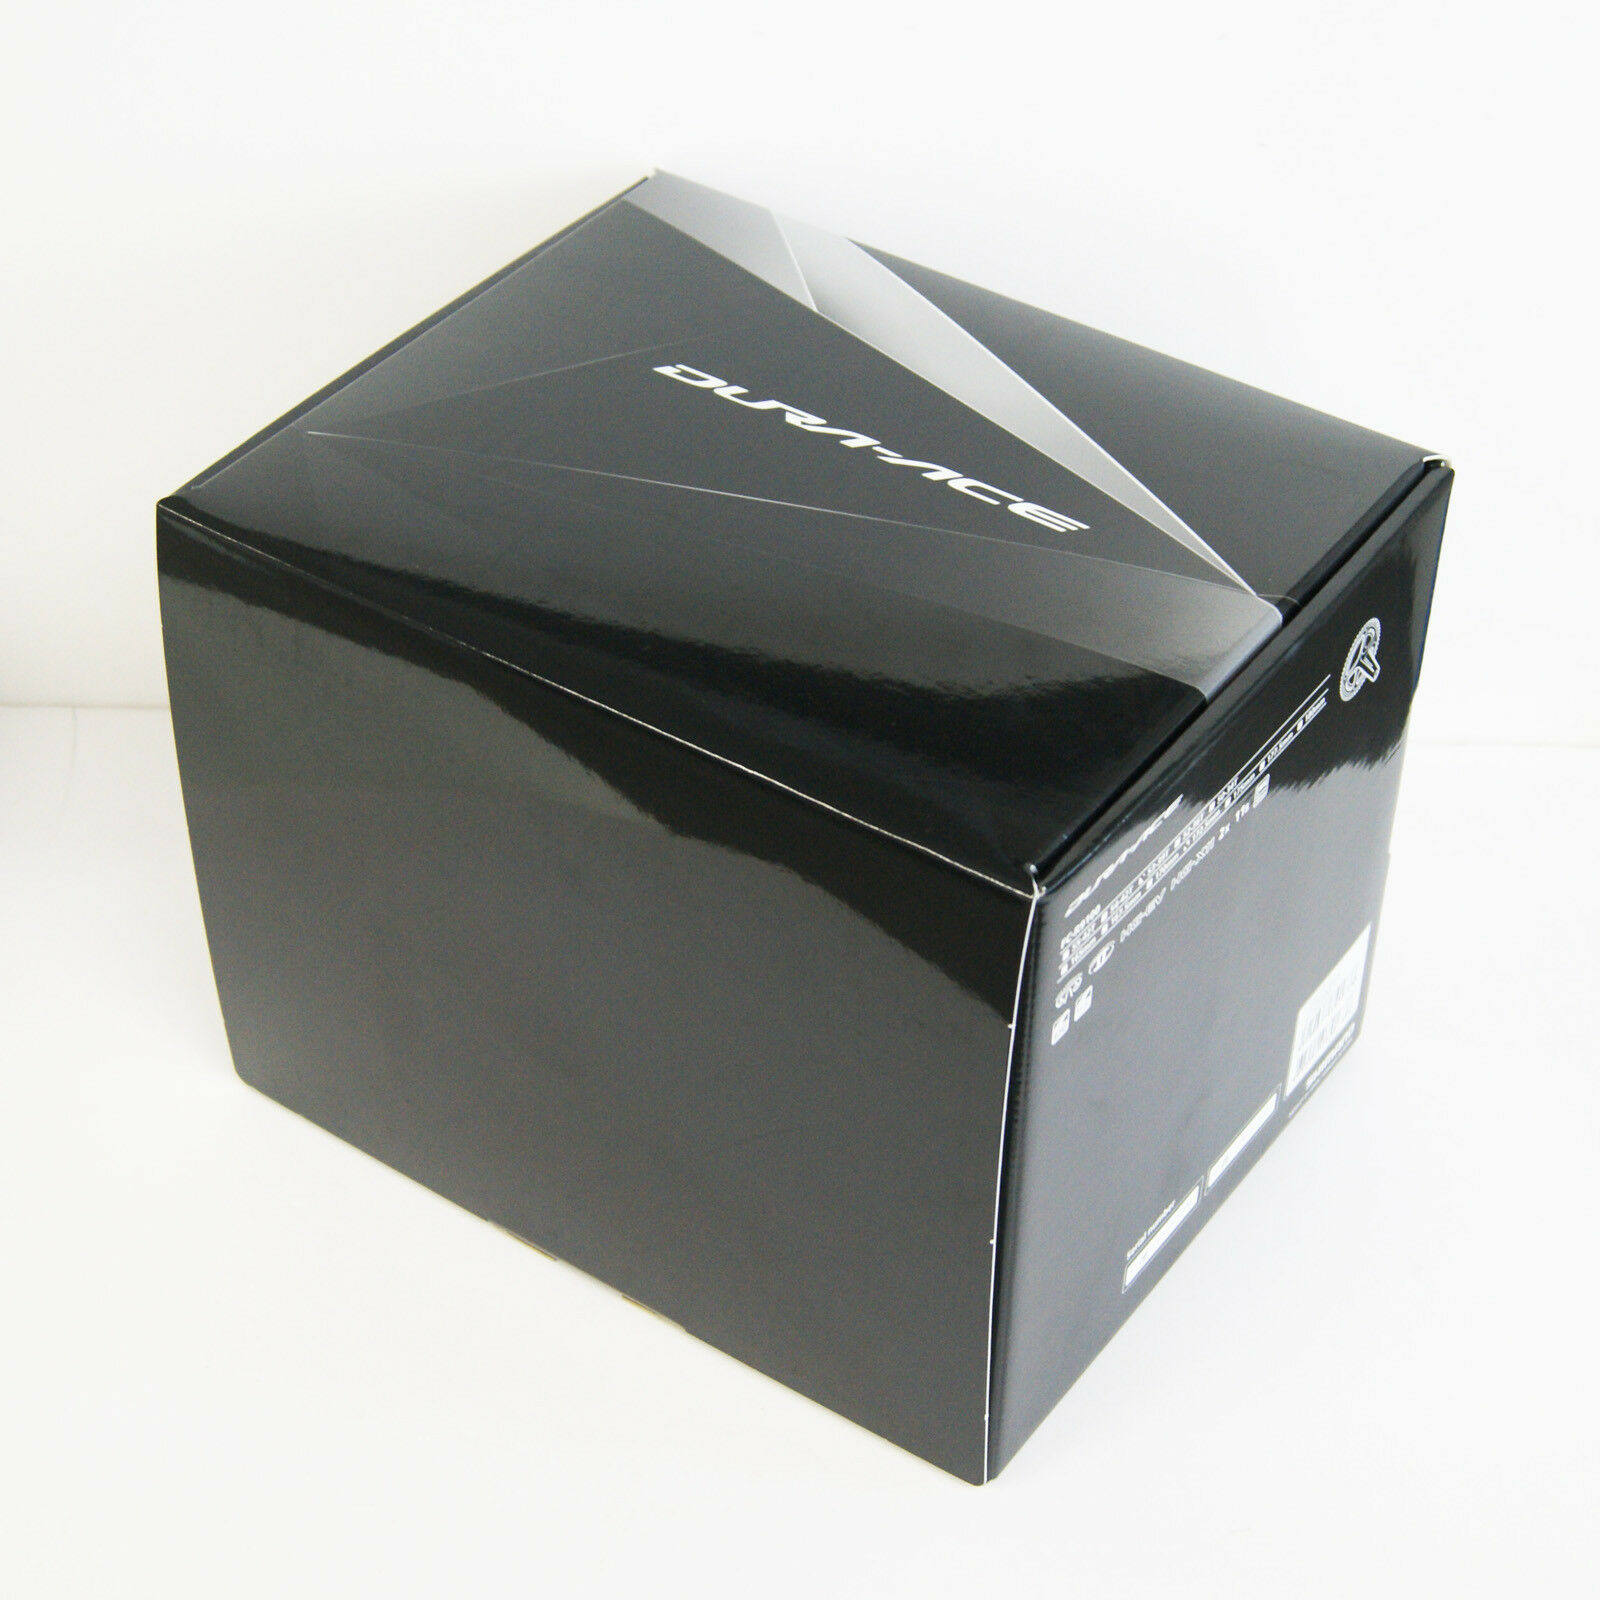 Shimano Dura-Ace FC-R9100 53-39T 172.5mm 11-Speed Crankset IFCR9100DX39